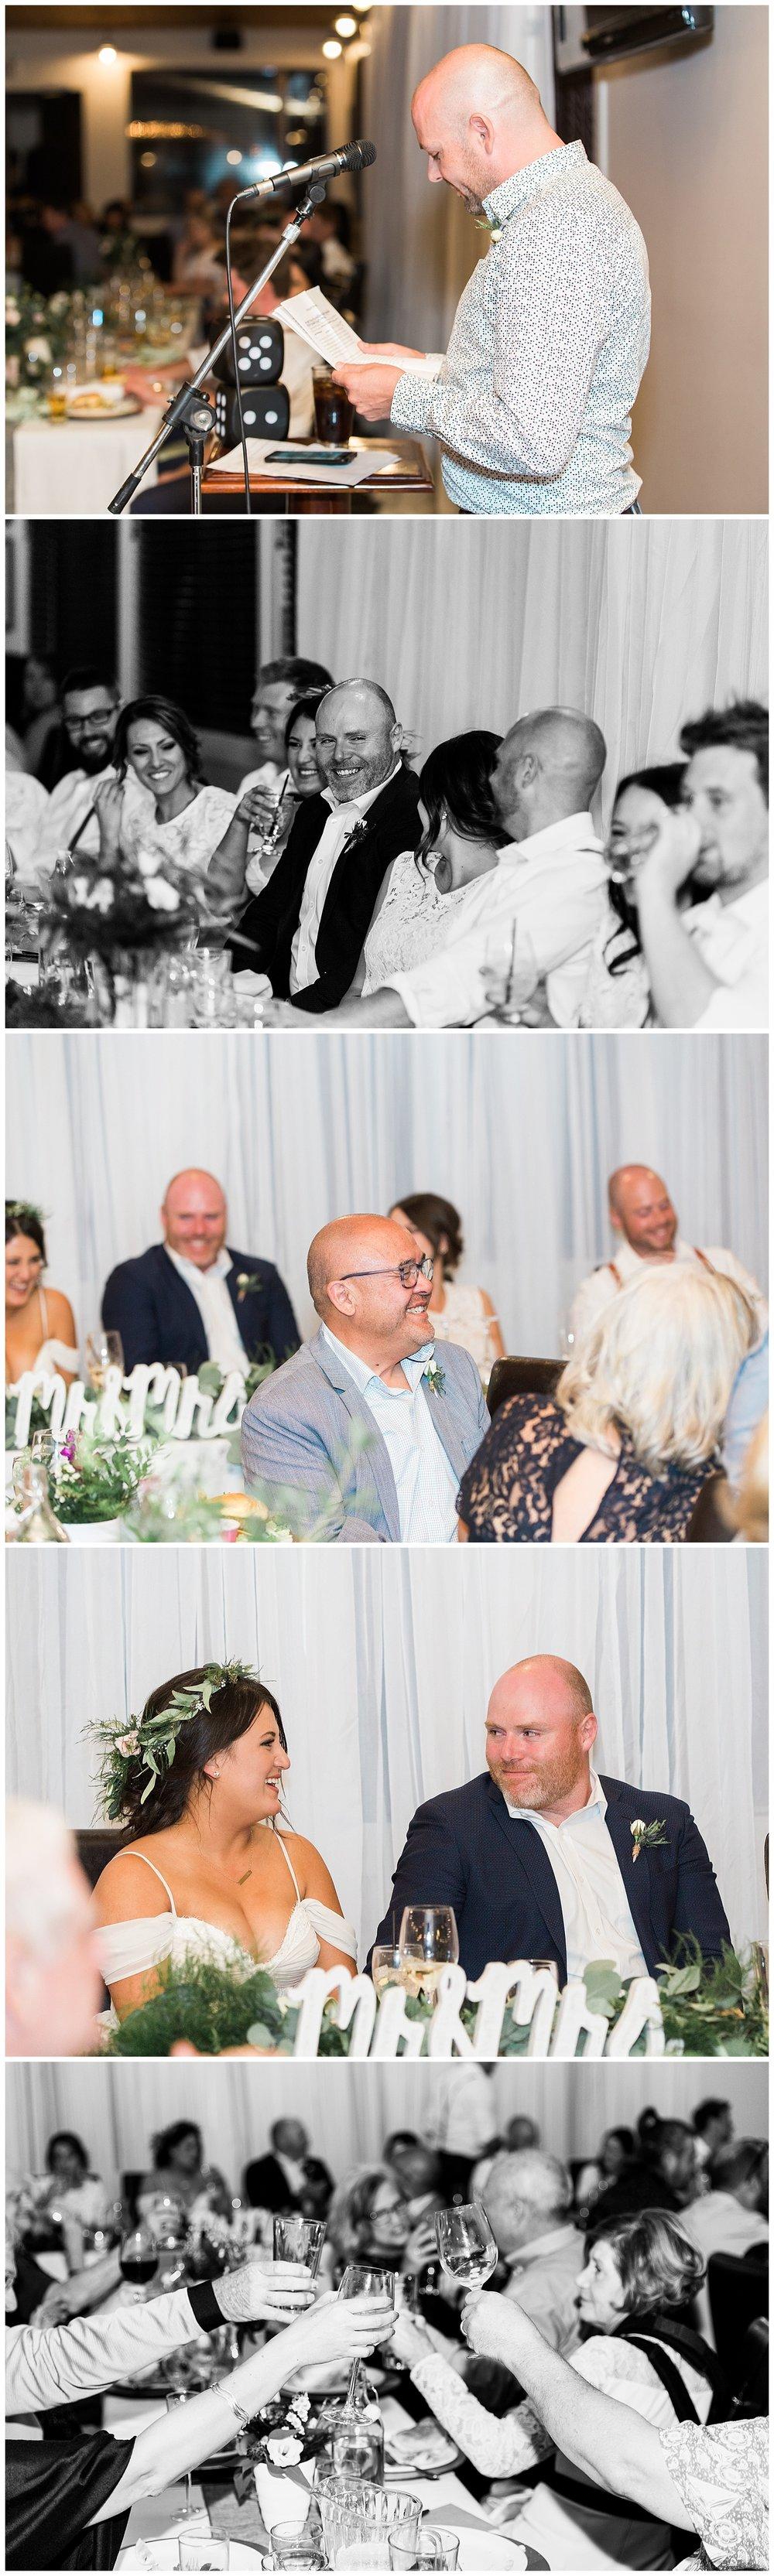 Calgary-wedding-photographer-springbank-links-golf-course-_0025.jpg